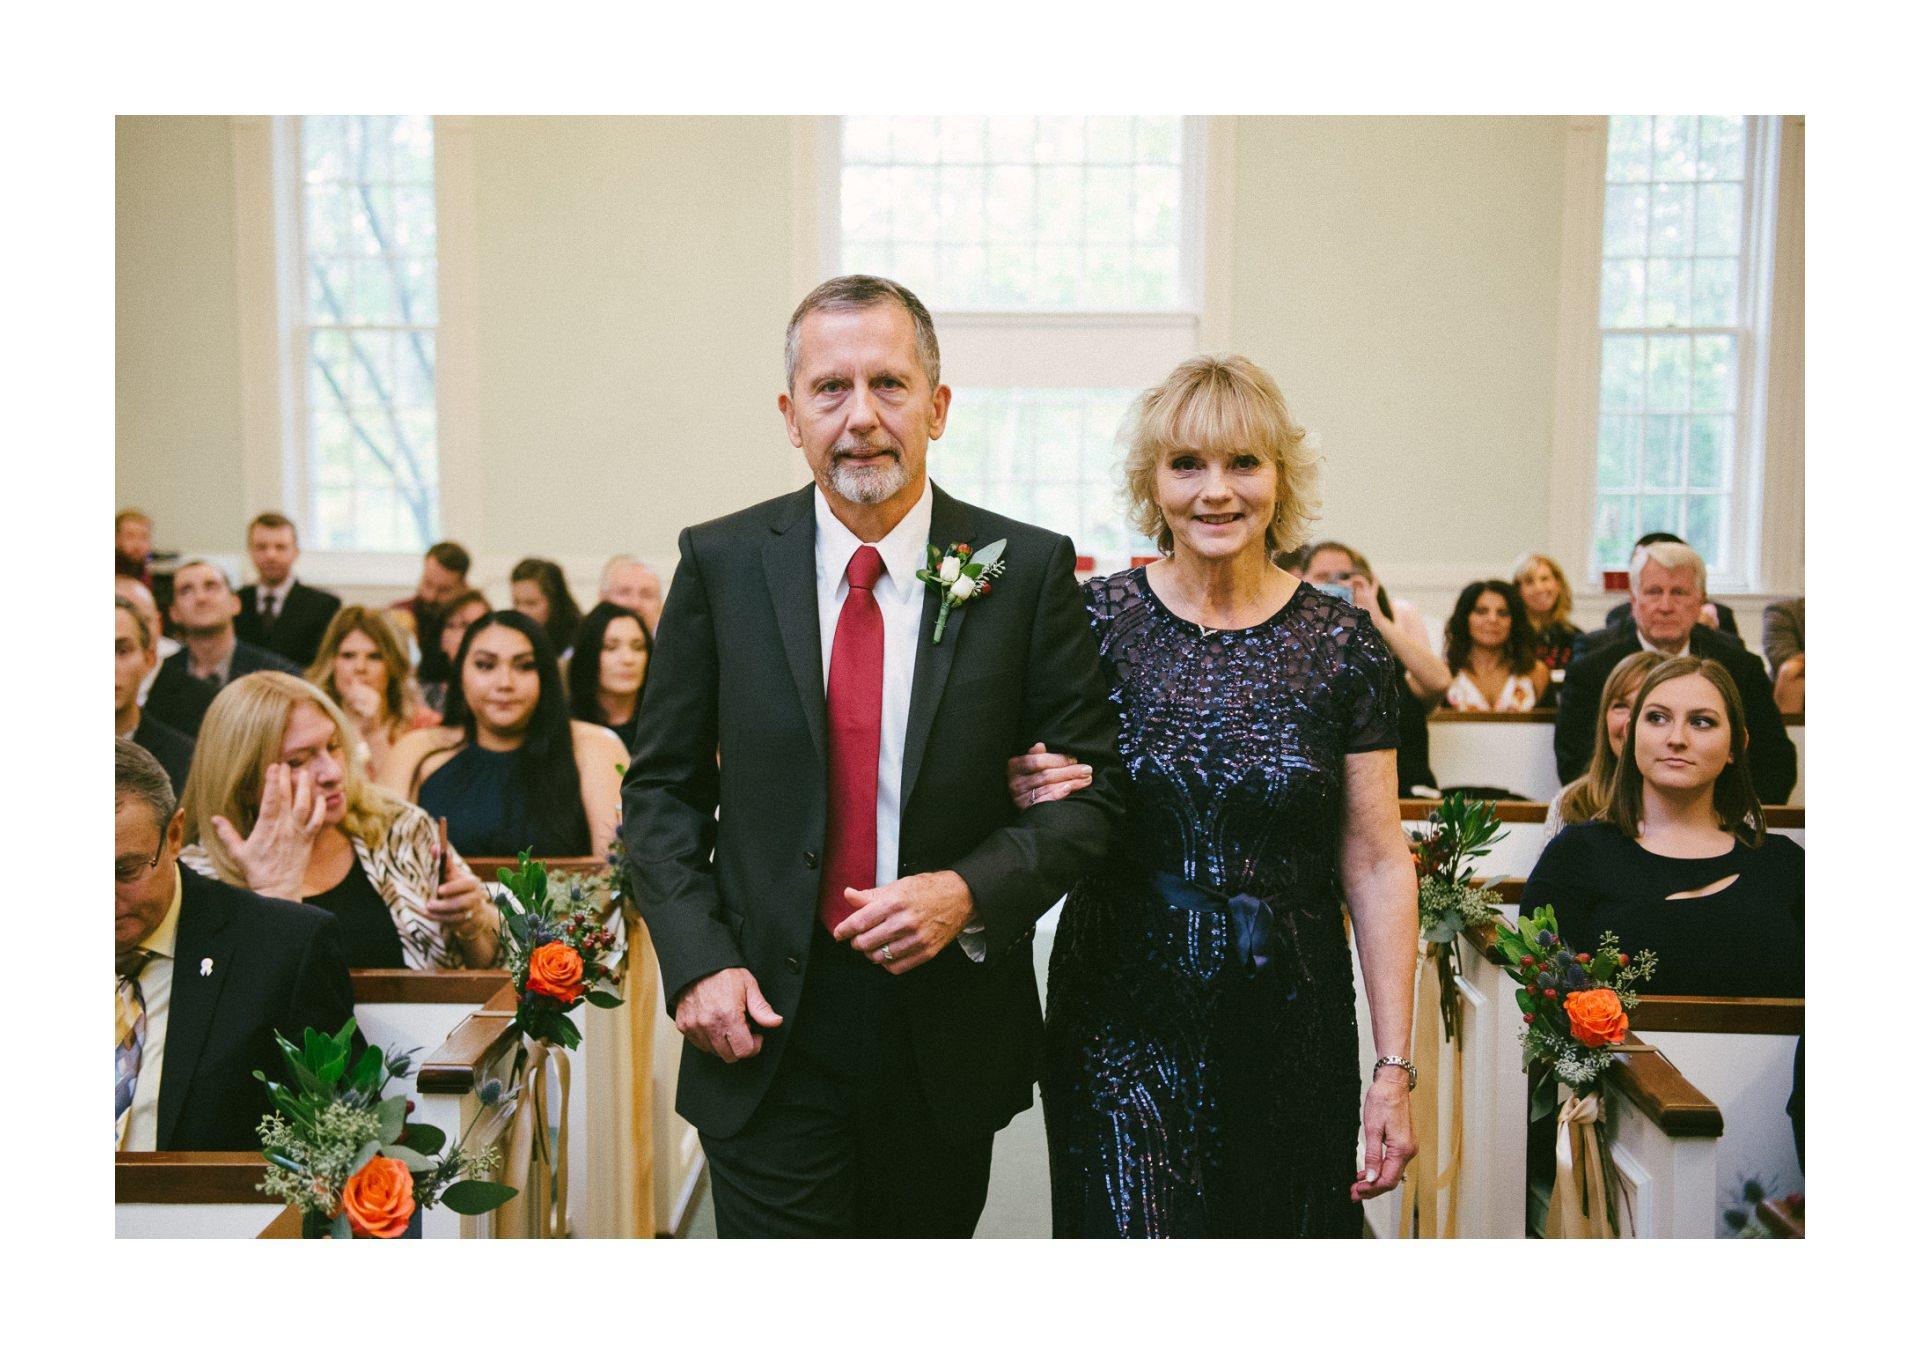 Patterson Fruit Farm Wedding Photographer in Cleveland 1 16.jpg